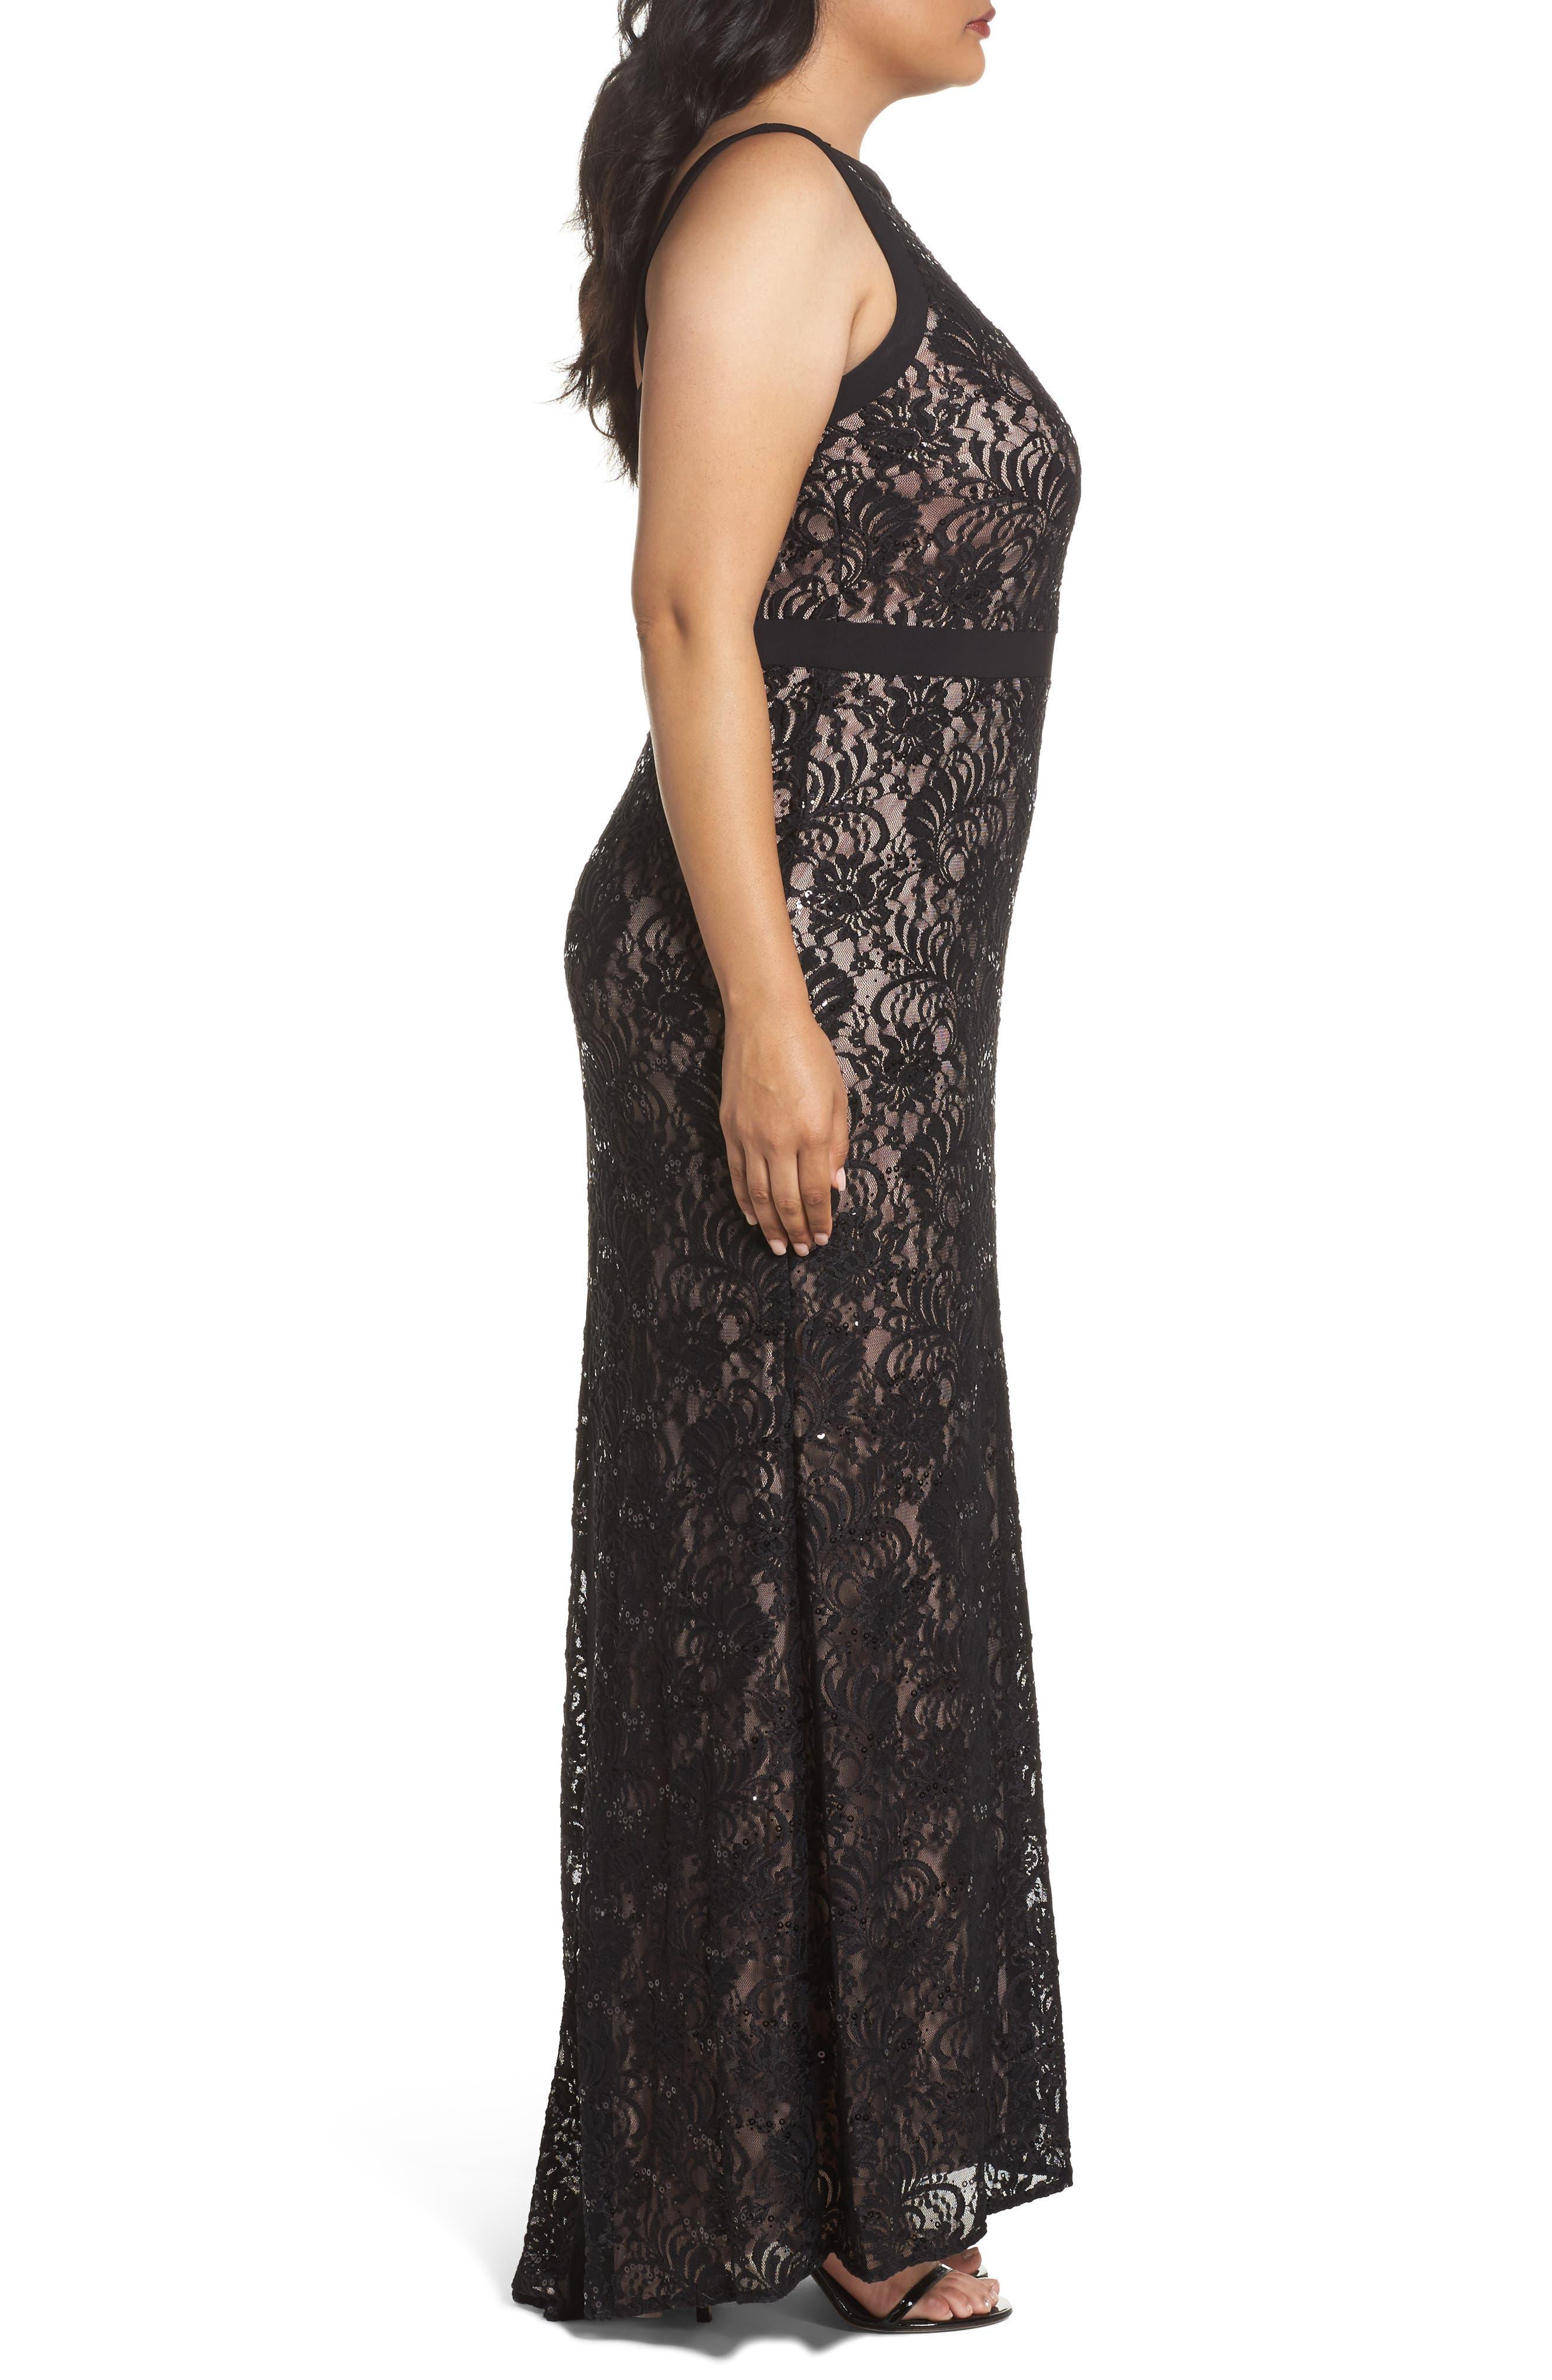 Lace Square Neck Gown,                             Alternate thumbnail 3, color,                             BLACK/ NUDE